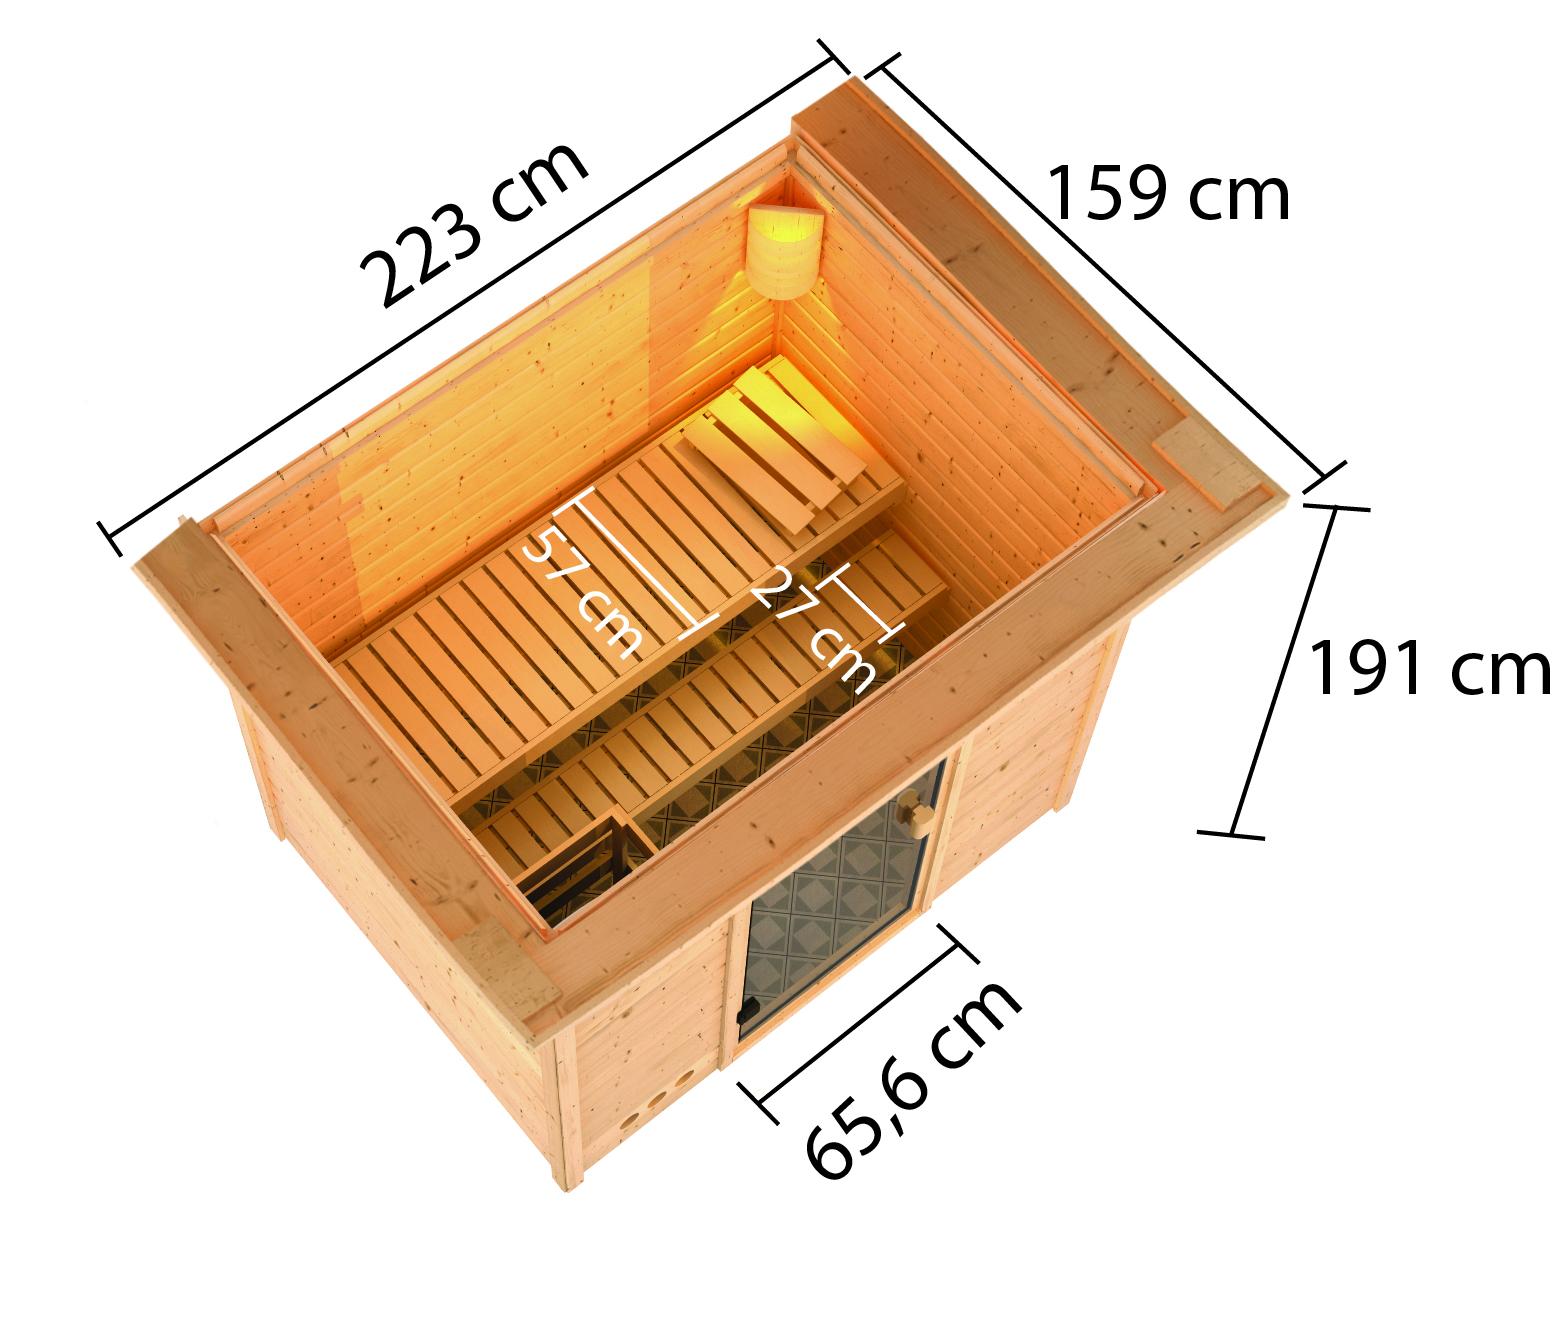 Woodfeeling Sauna Selena 38mm Dachkranz 230V Bio Saunaofen 3,6 kW ext. Bild 2